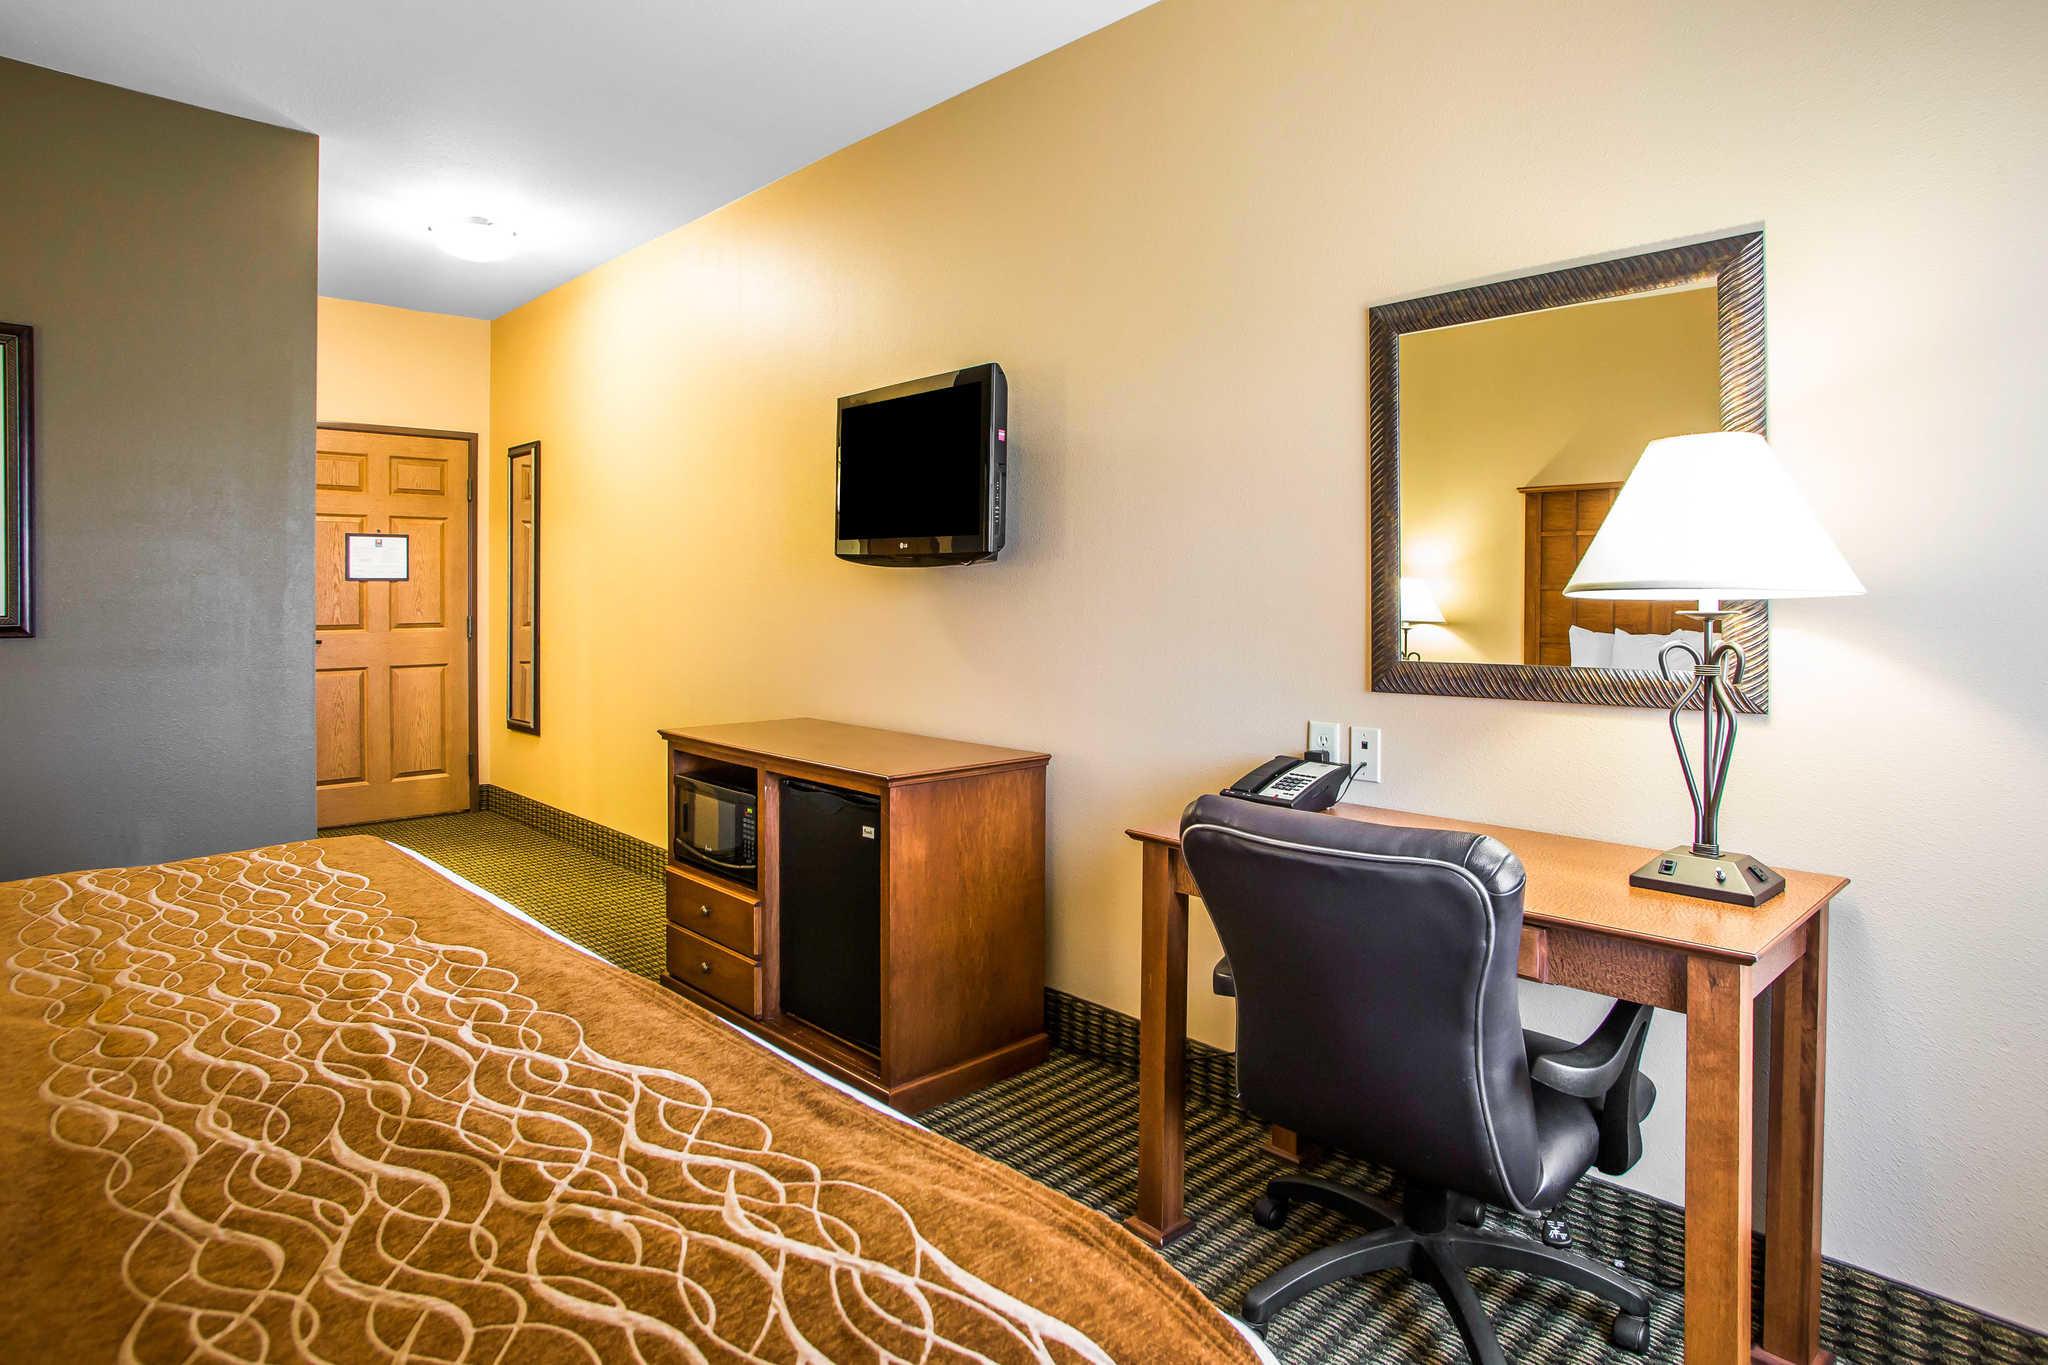 Comfort Inn & Suites image 15